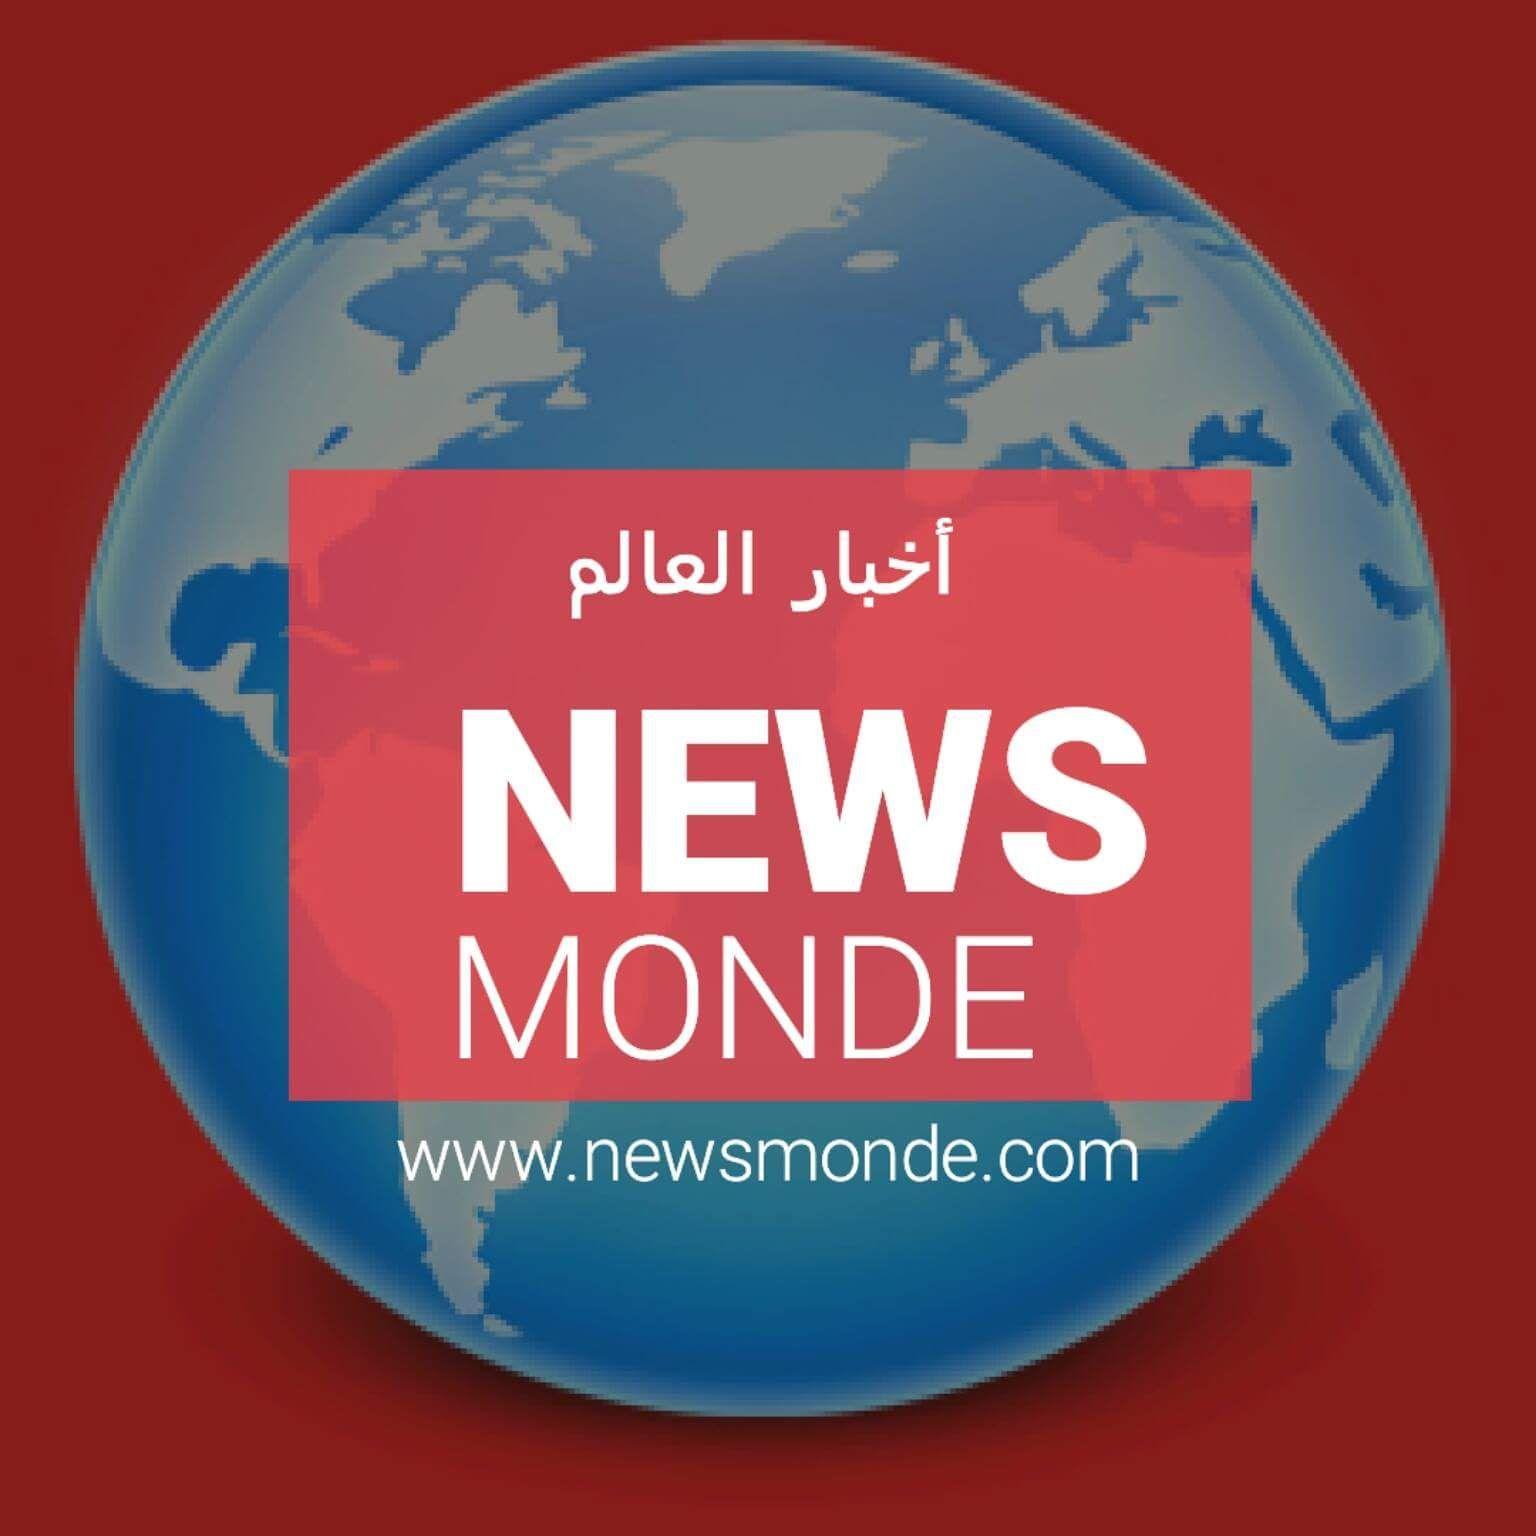 News Monde